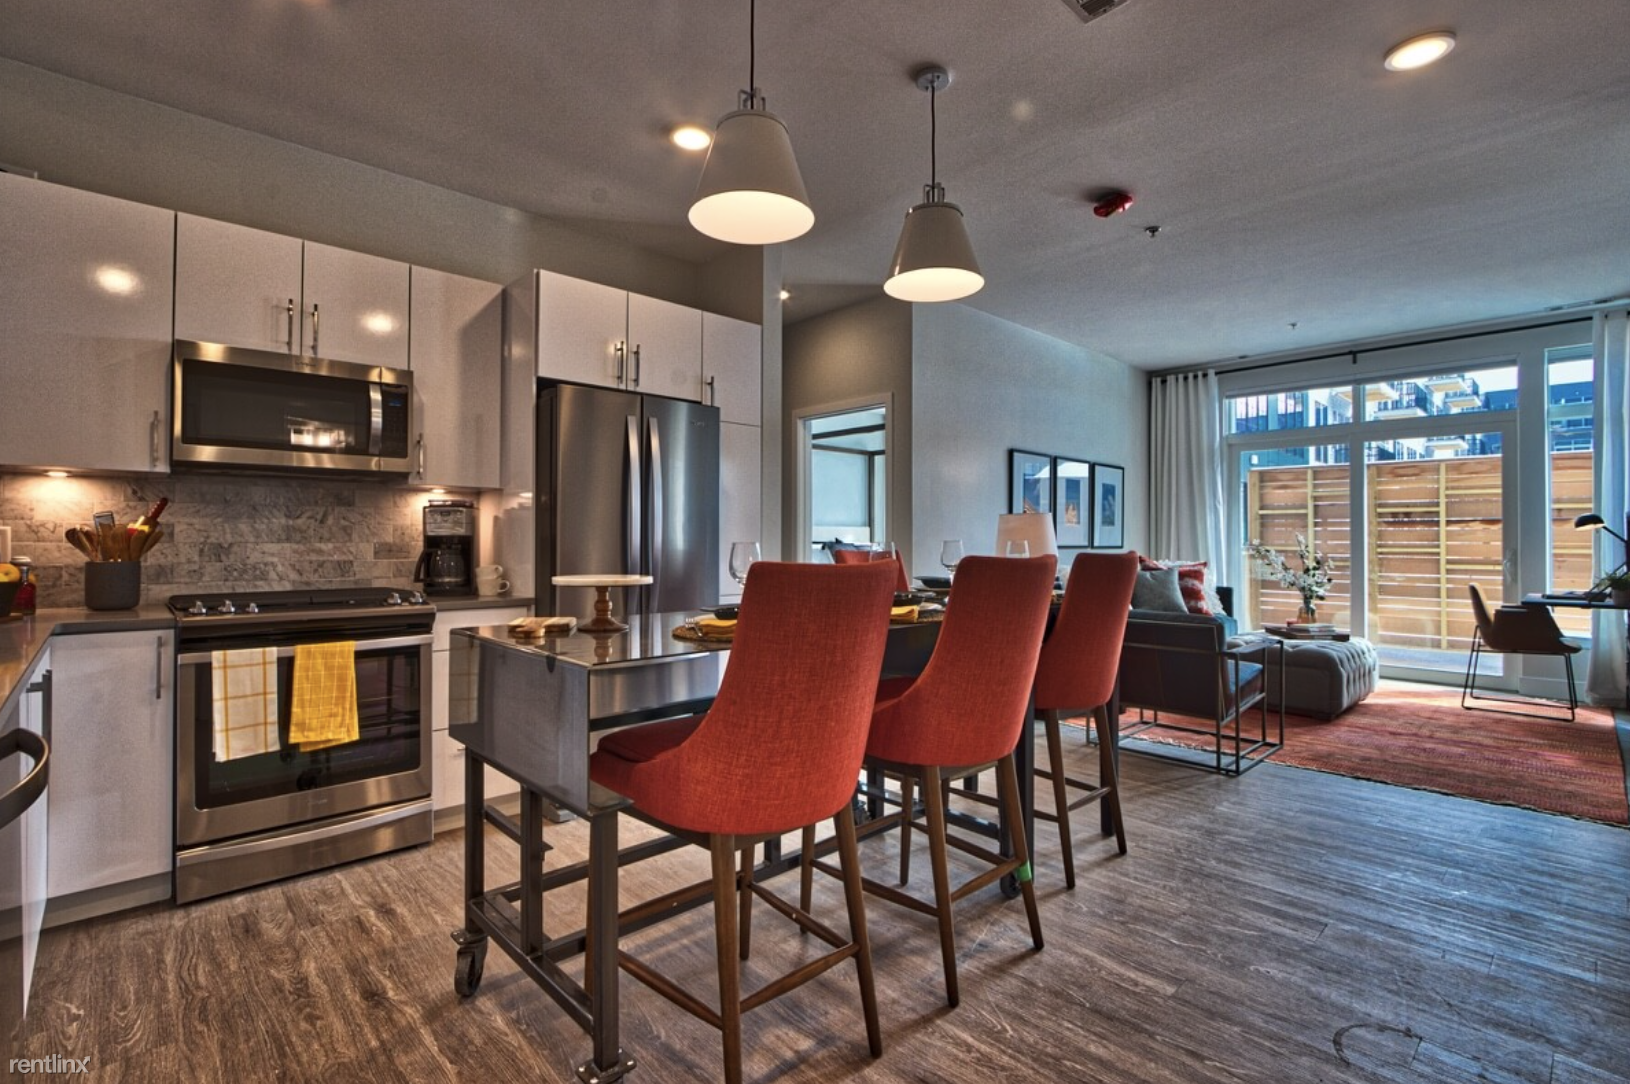 Apartment for Rent in Everett